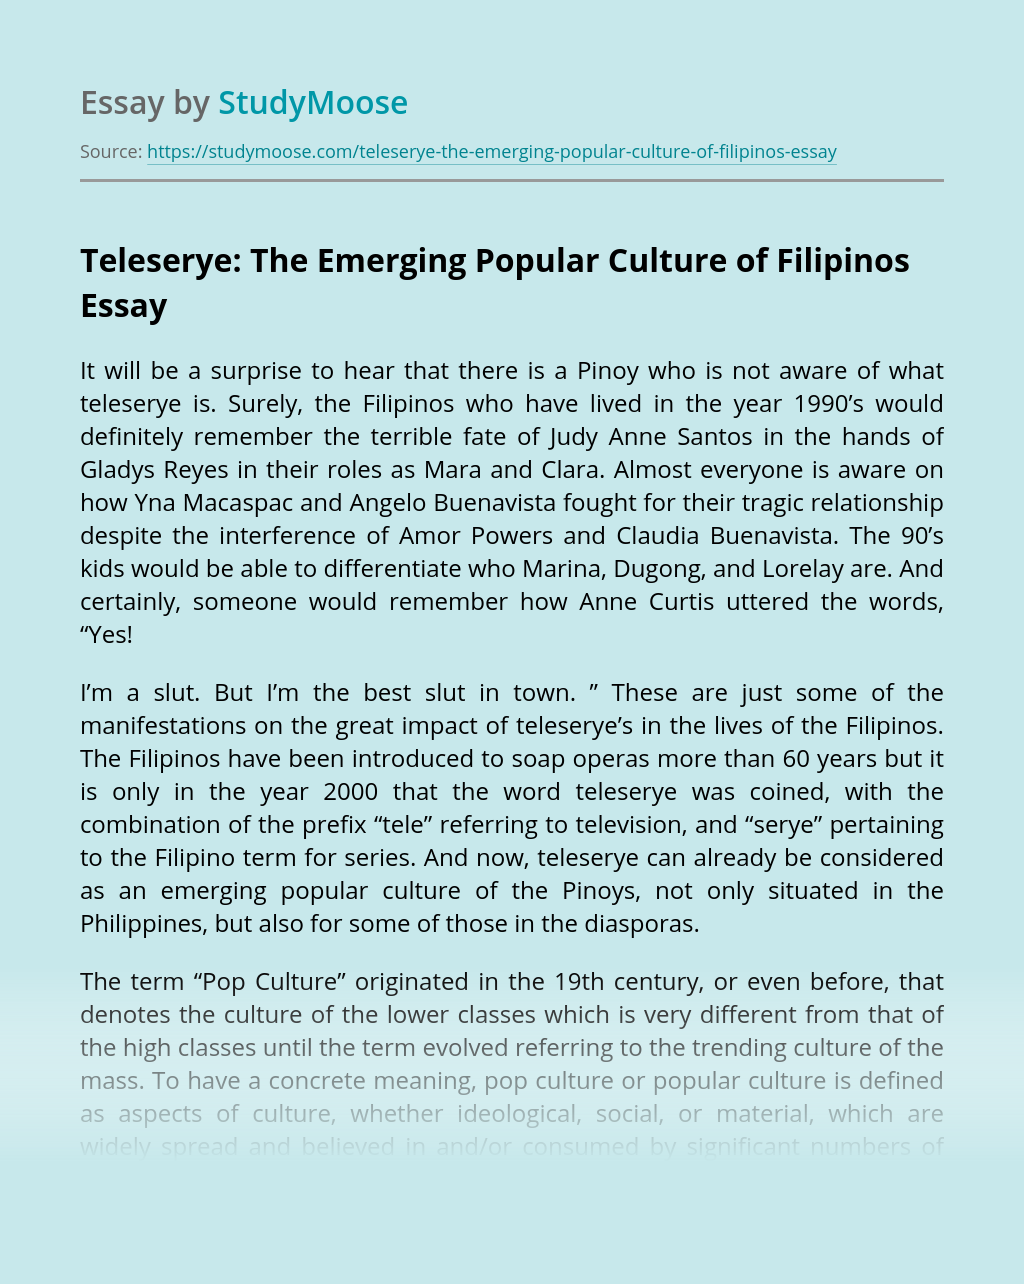 Teleserye: The Emerging Popular Culture of Filipinos